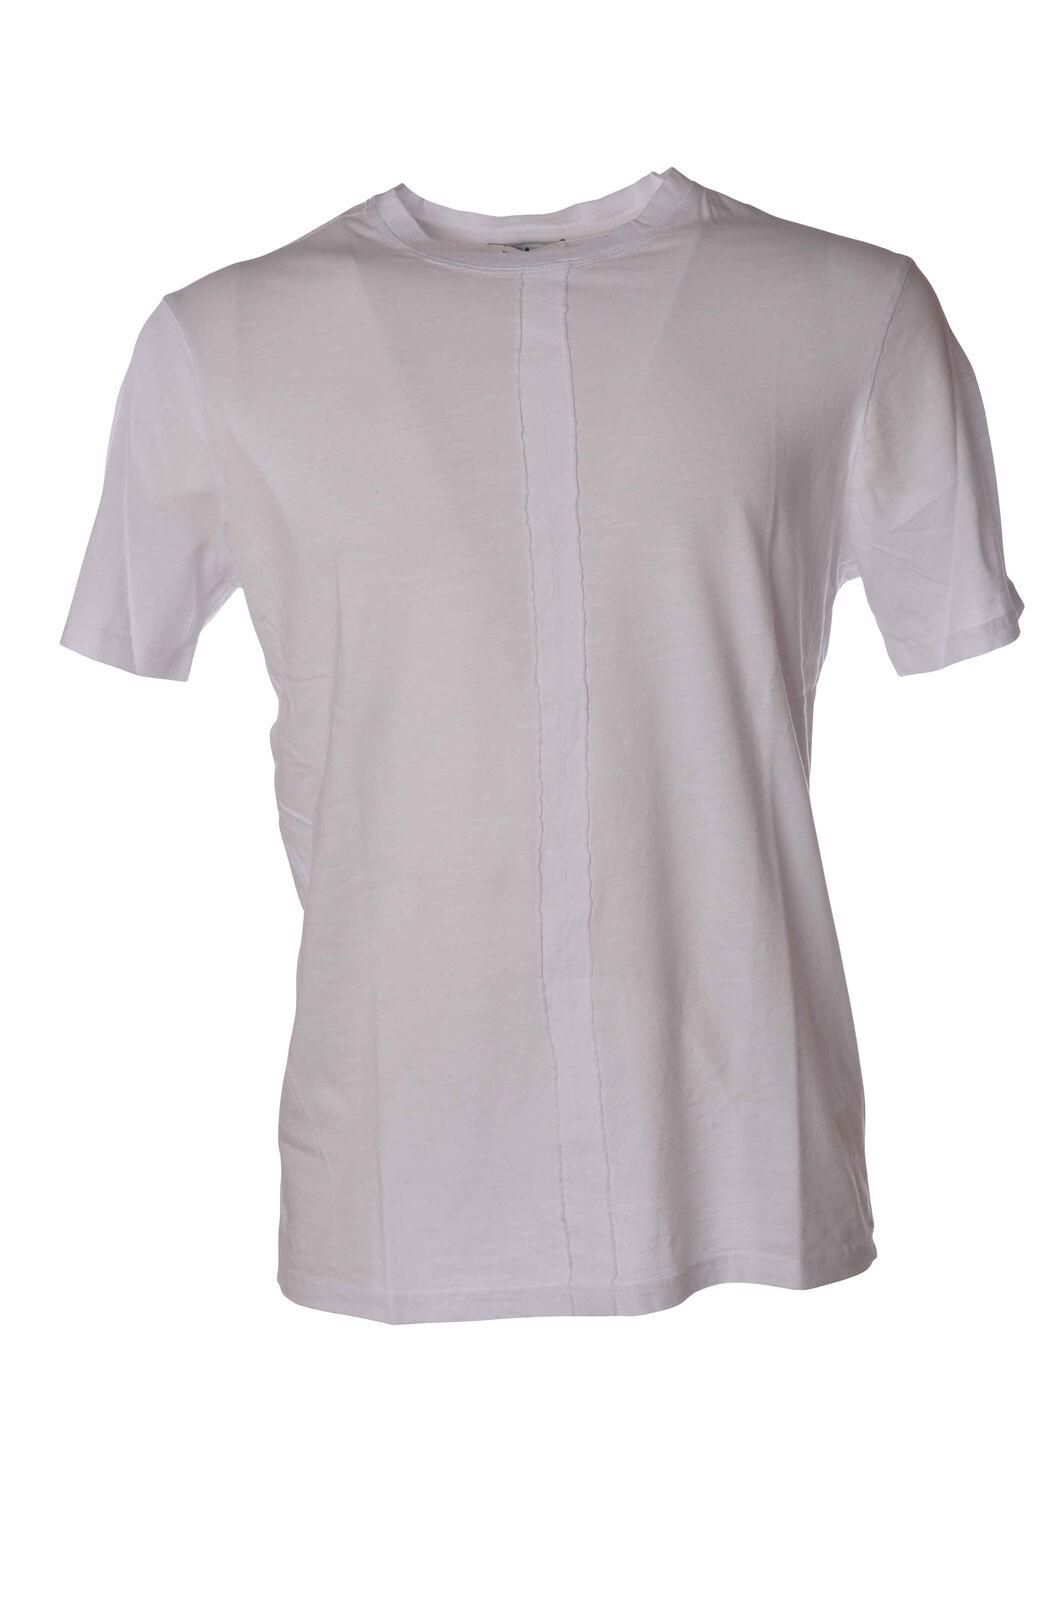 Paolo Pecora - Topwear-T-shirts - herren - Bianco - 5207531G180917